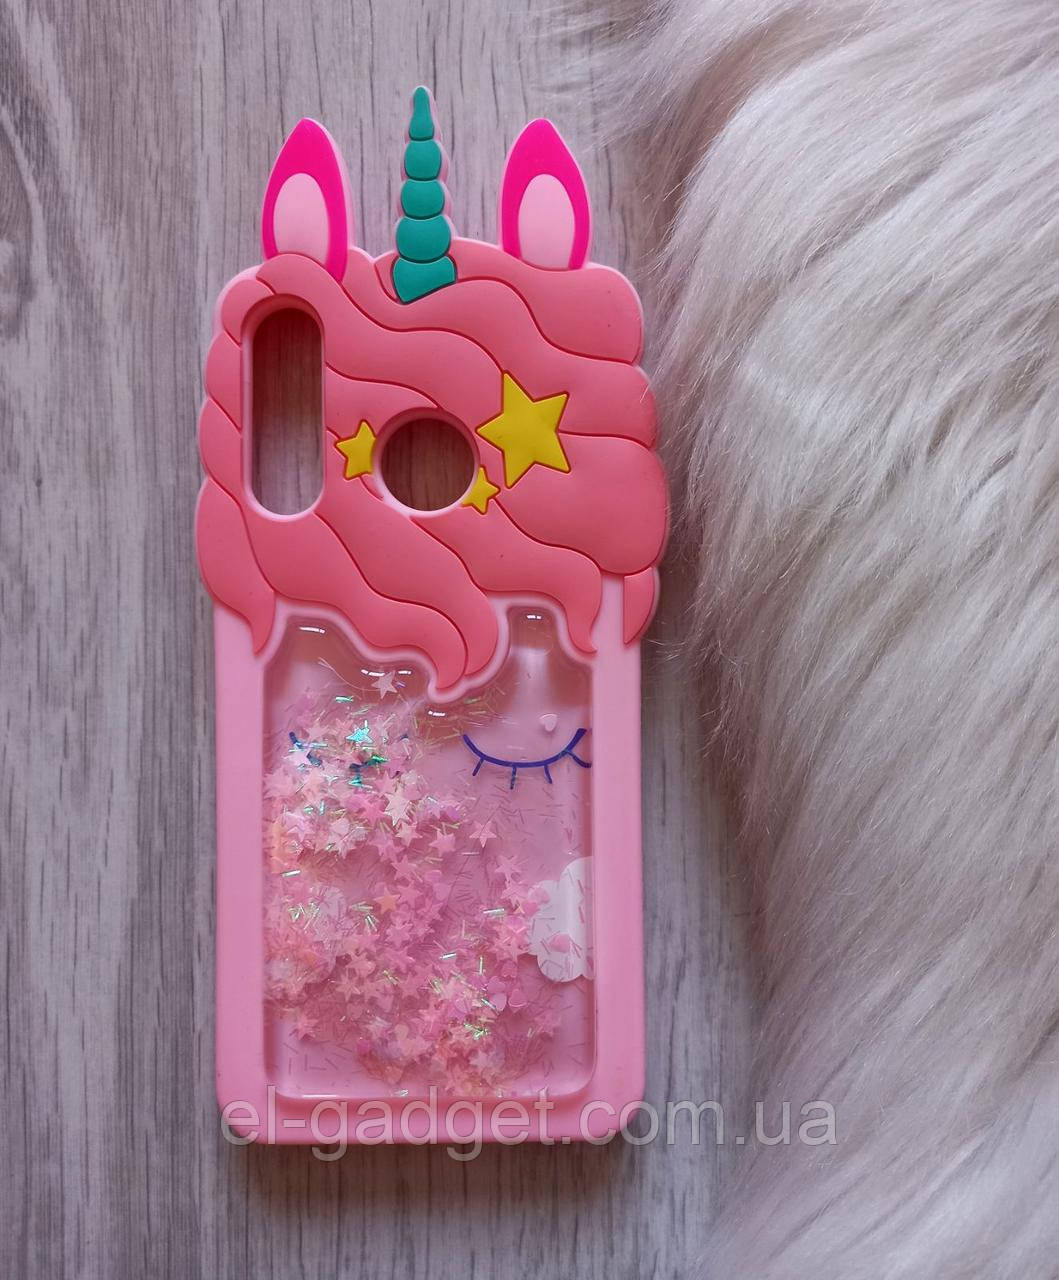 Чехол на Huawei P30 Lite Единорог розовый с блестками